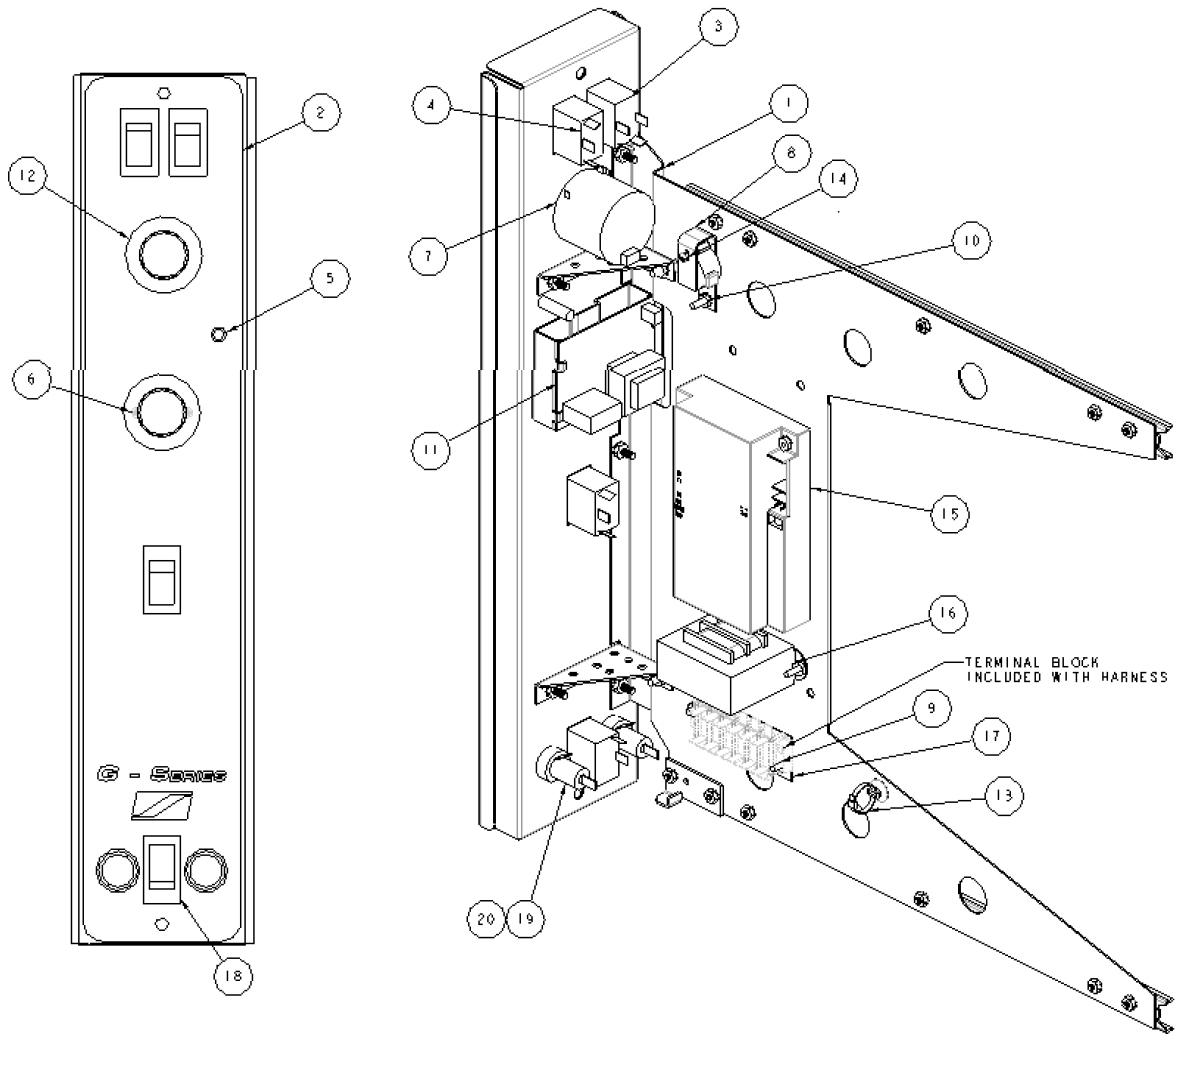 imperial fryer wiring diagram lawn mower engine parts